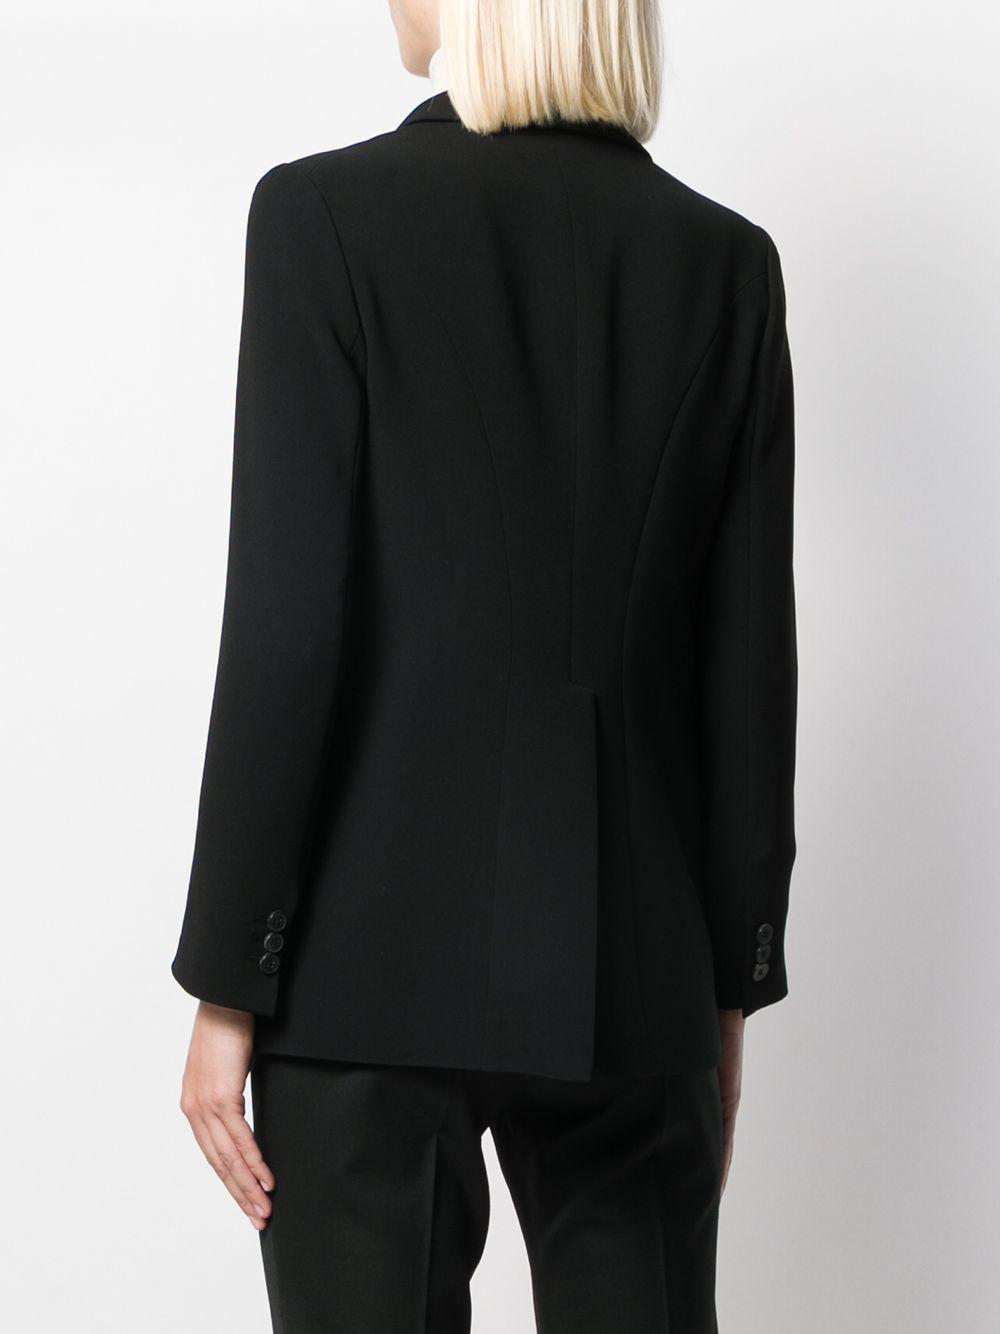 Black single-breasted blazer featuring peaked lapels ALBERTO BIANI |  | II855-AC003090